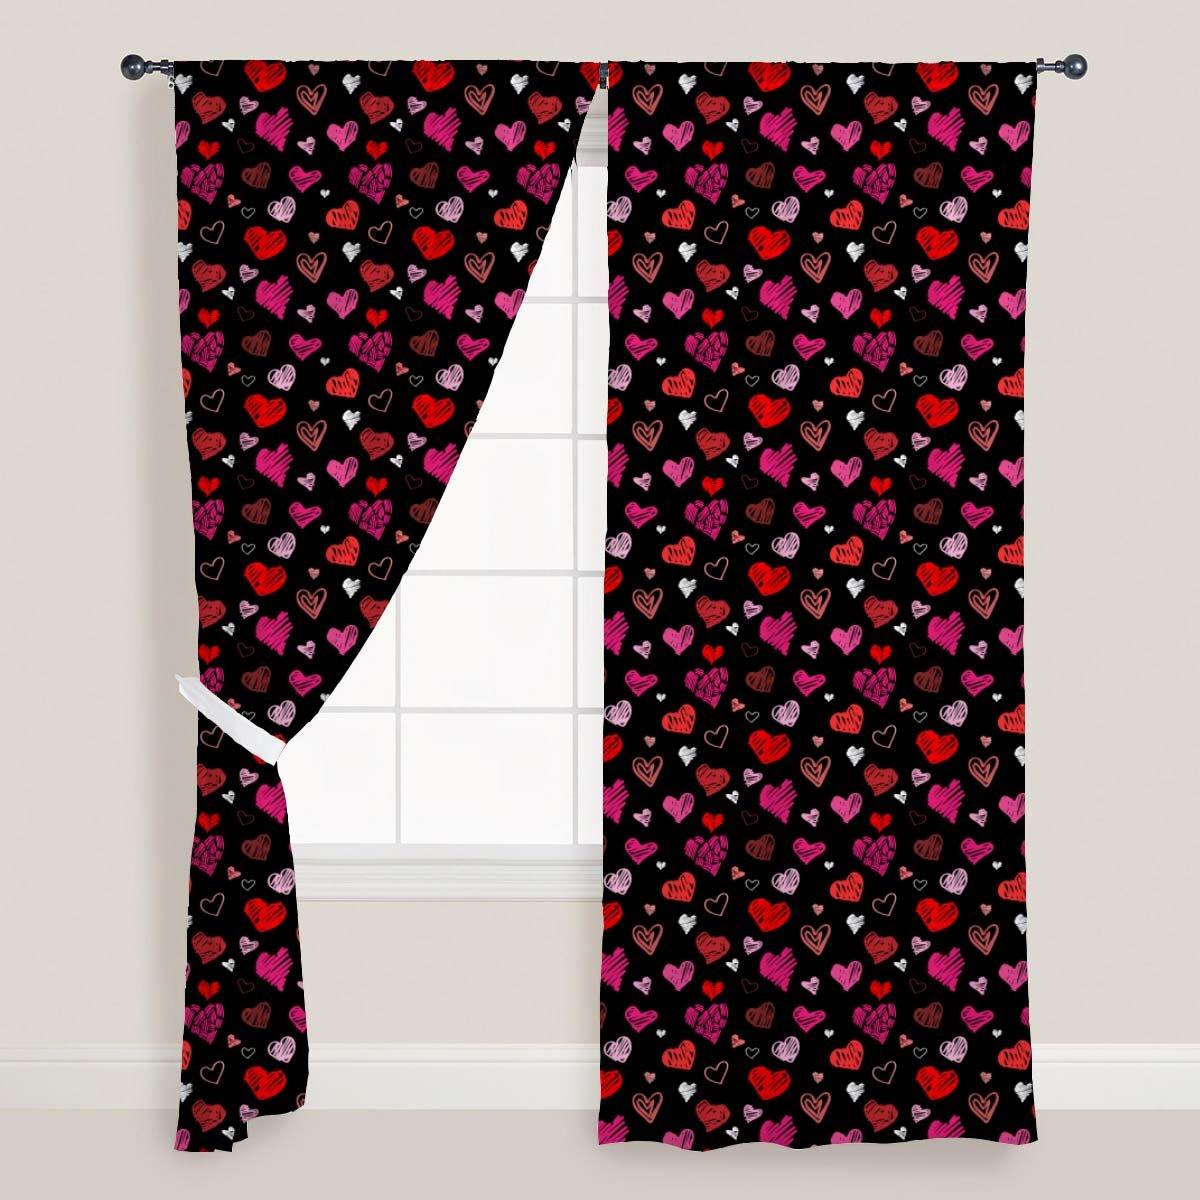 AZ Love Heart Door & Window Curtain Satin 4feet x 11feet; SET OF 3 PCS